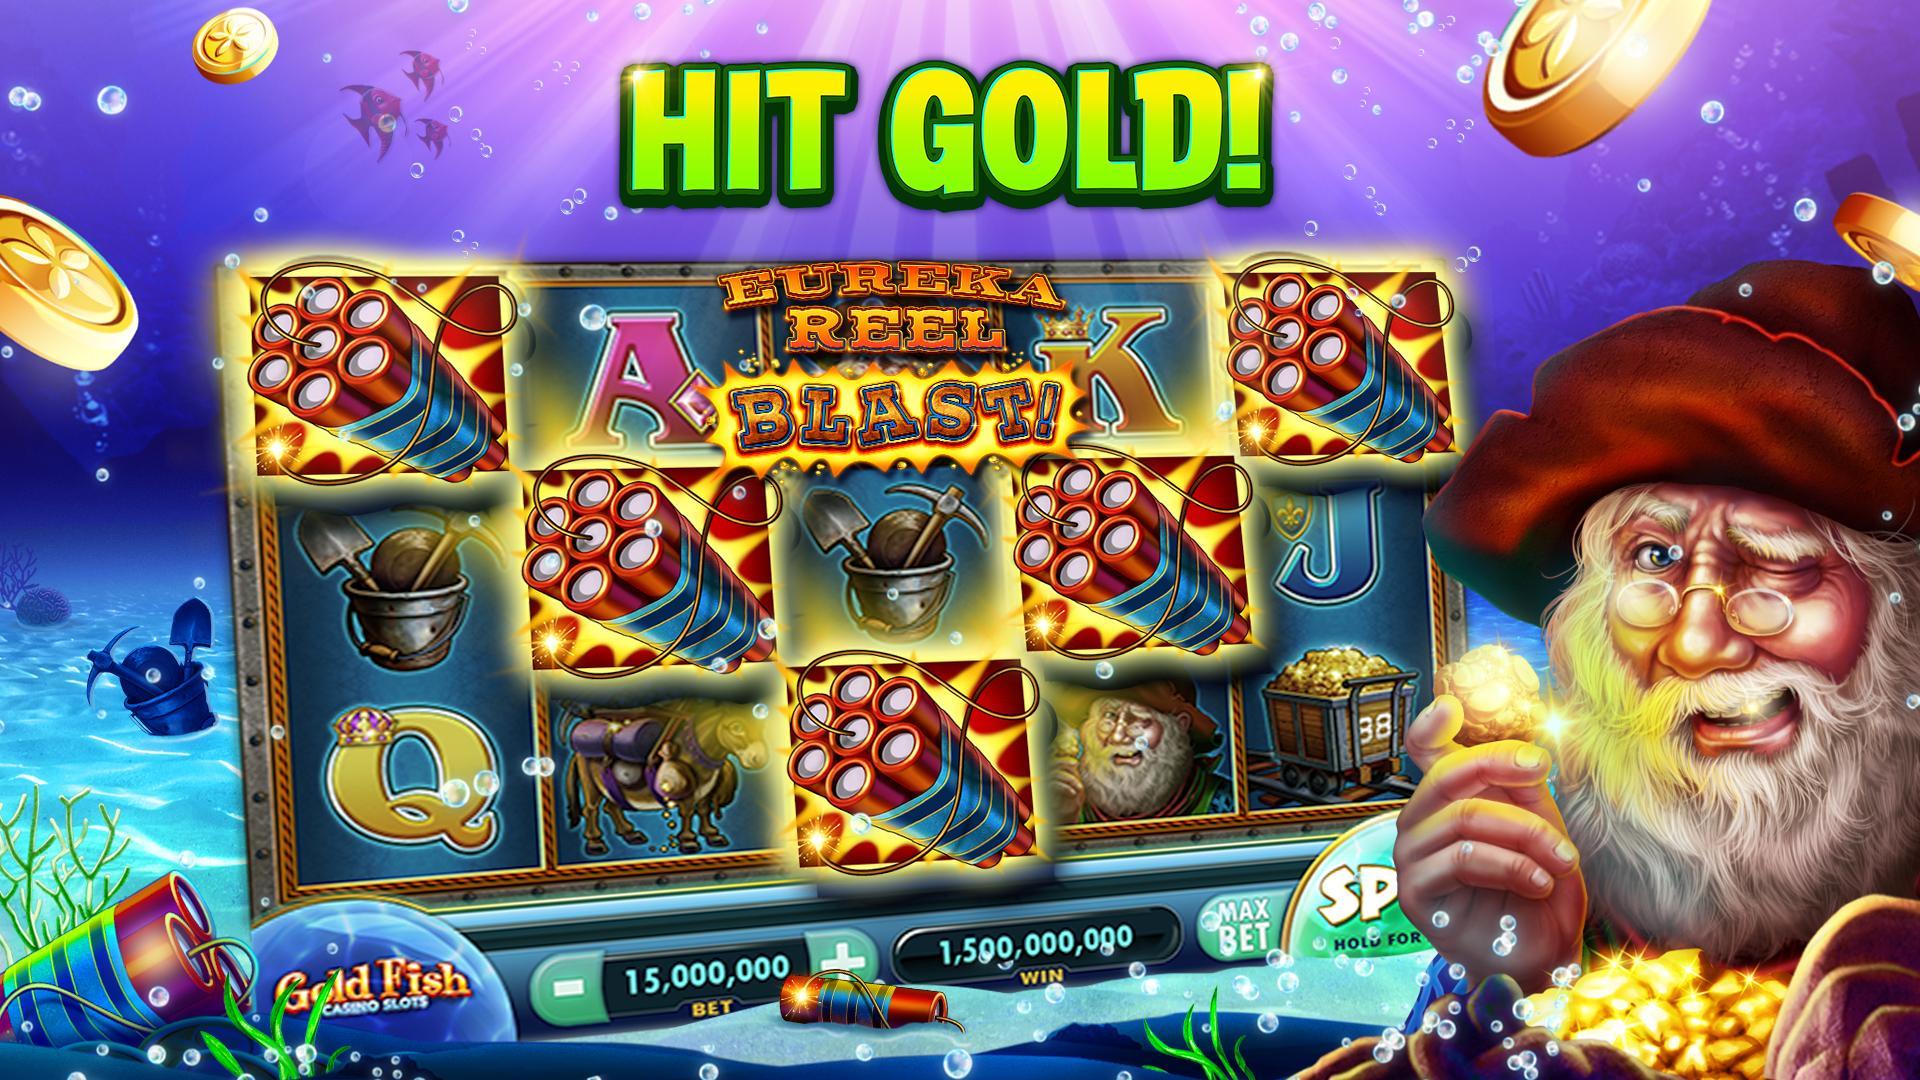 Blackjack soft 18